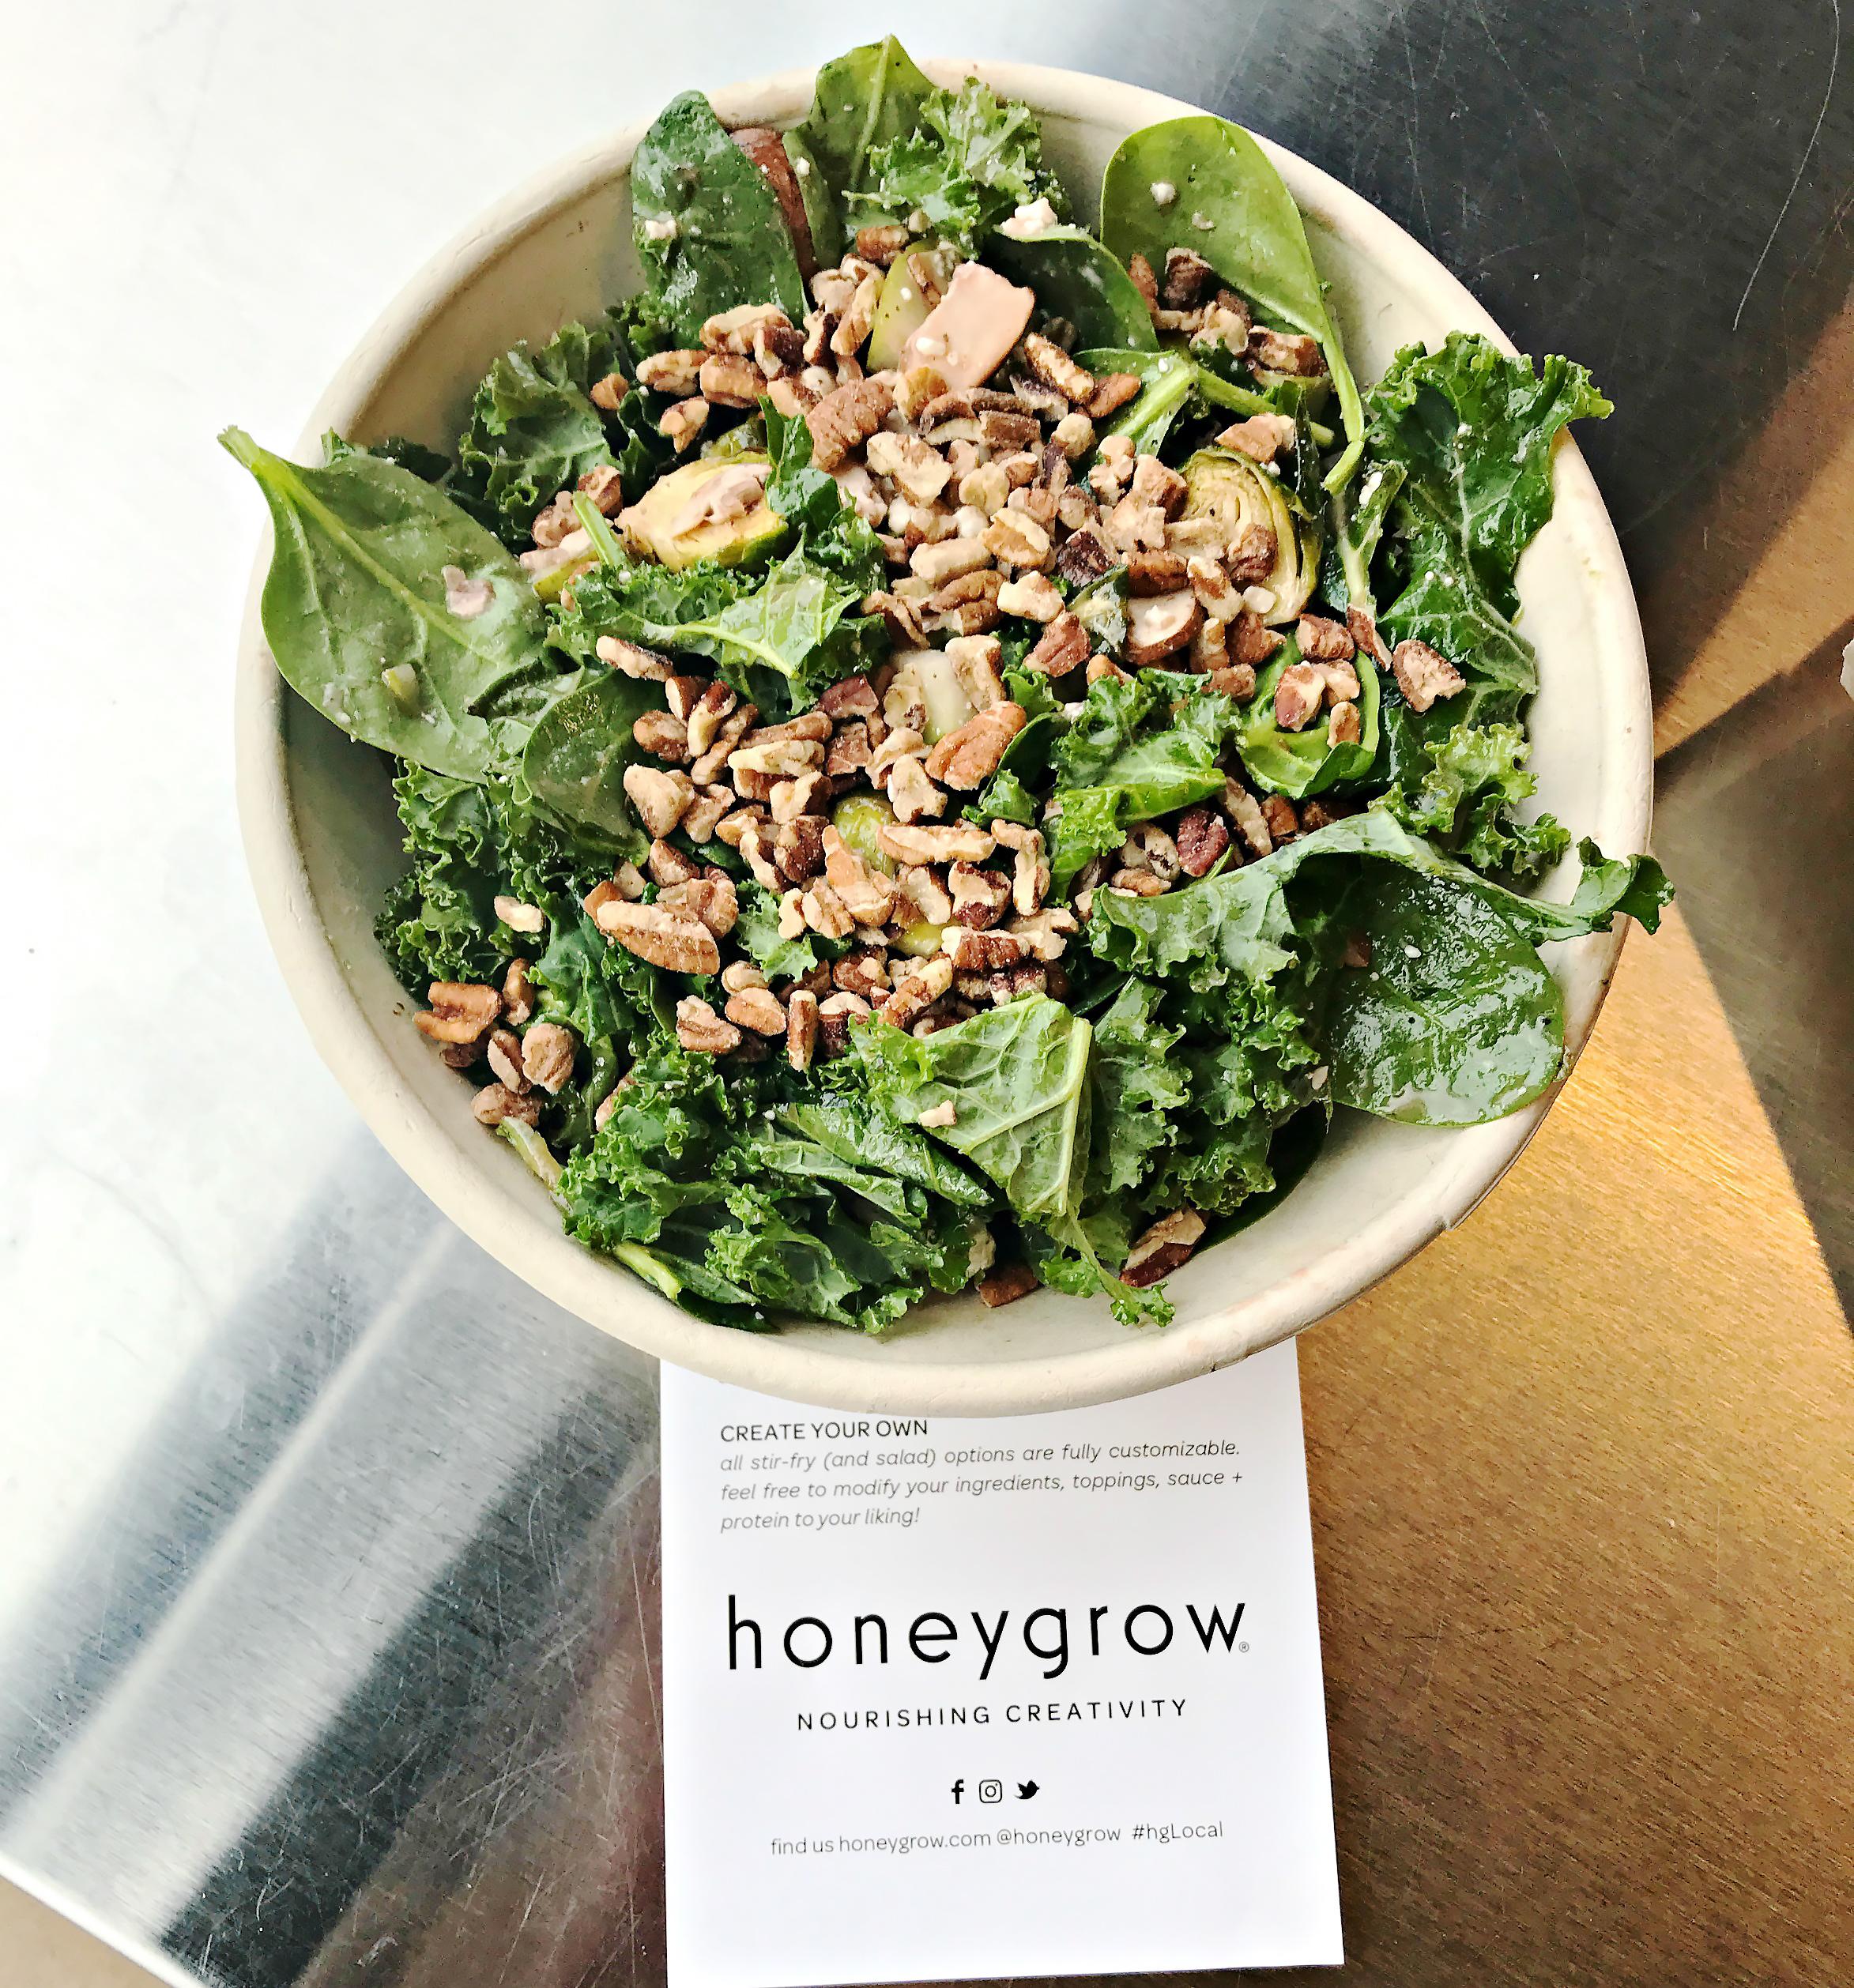 IMG_2166.JPG The Winter Kale salad at Honeygrow in East Liberty.